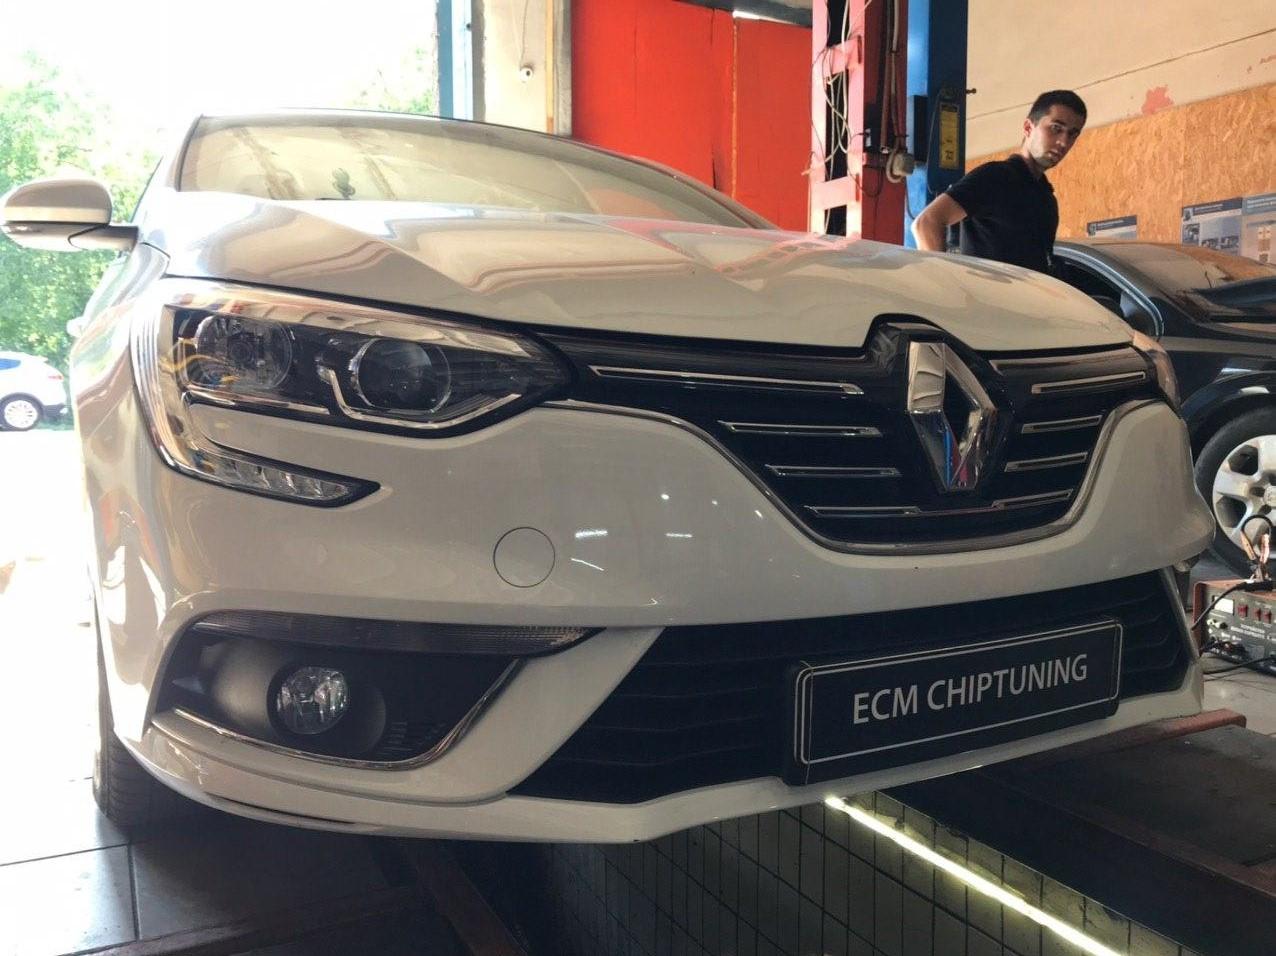 Renault Megane 1.5 dCi 115hp чип-тюнинг в Днепре